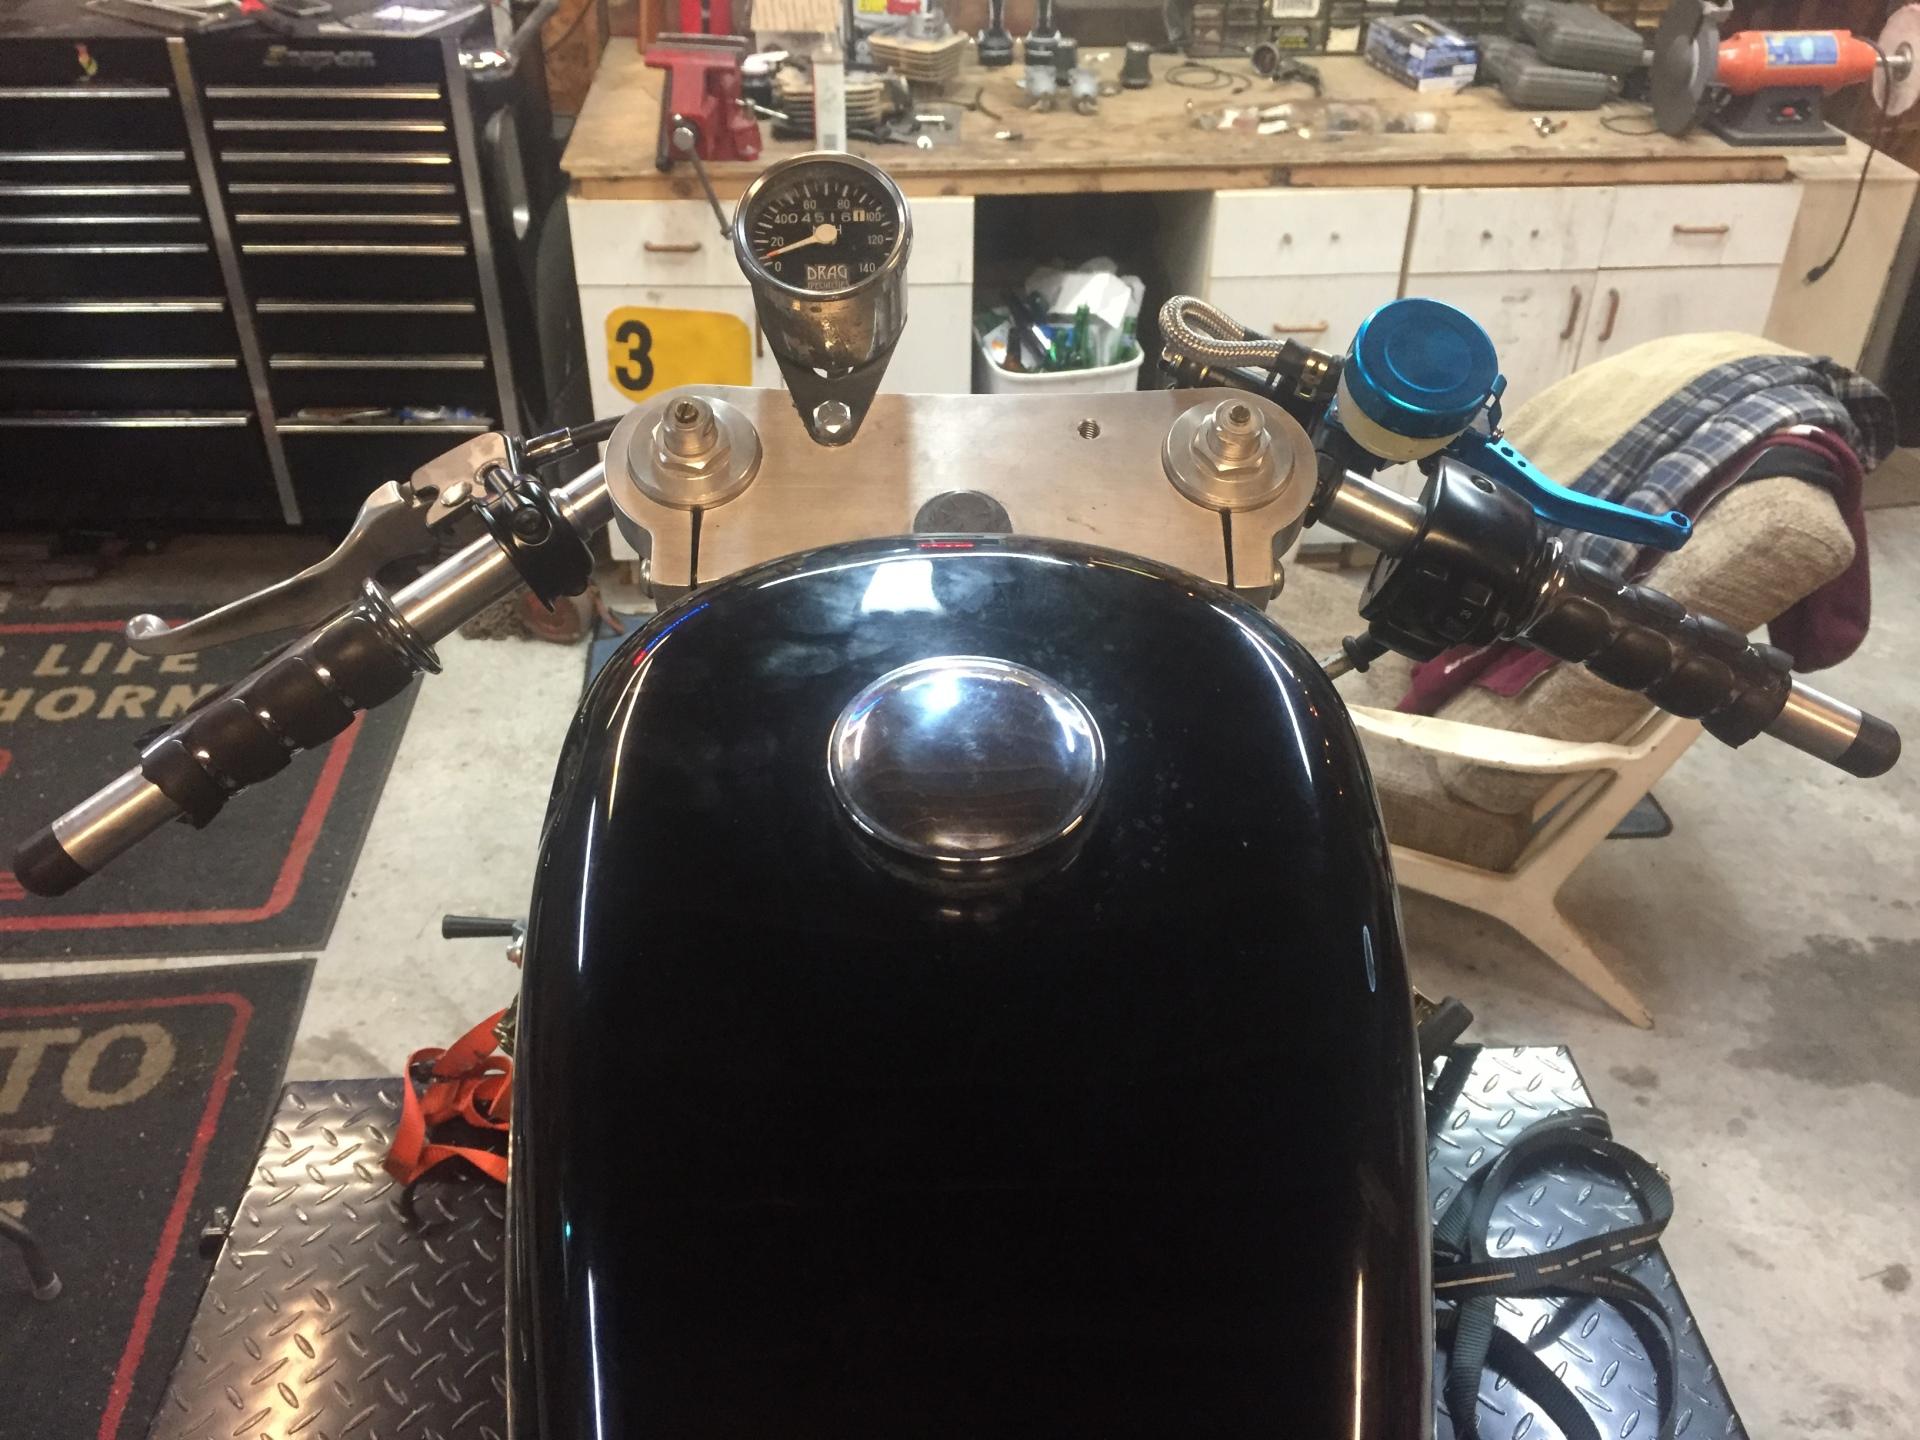 Rider's View